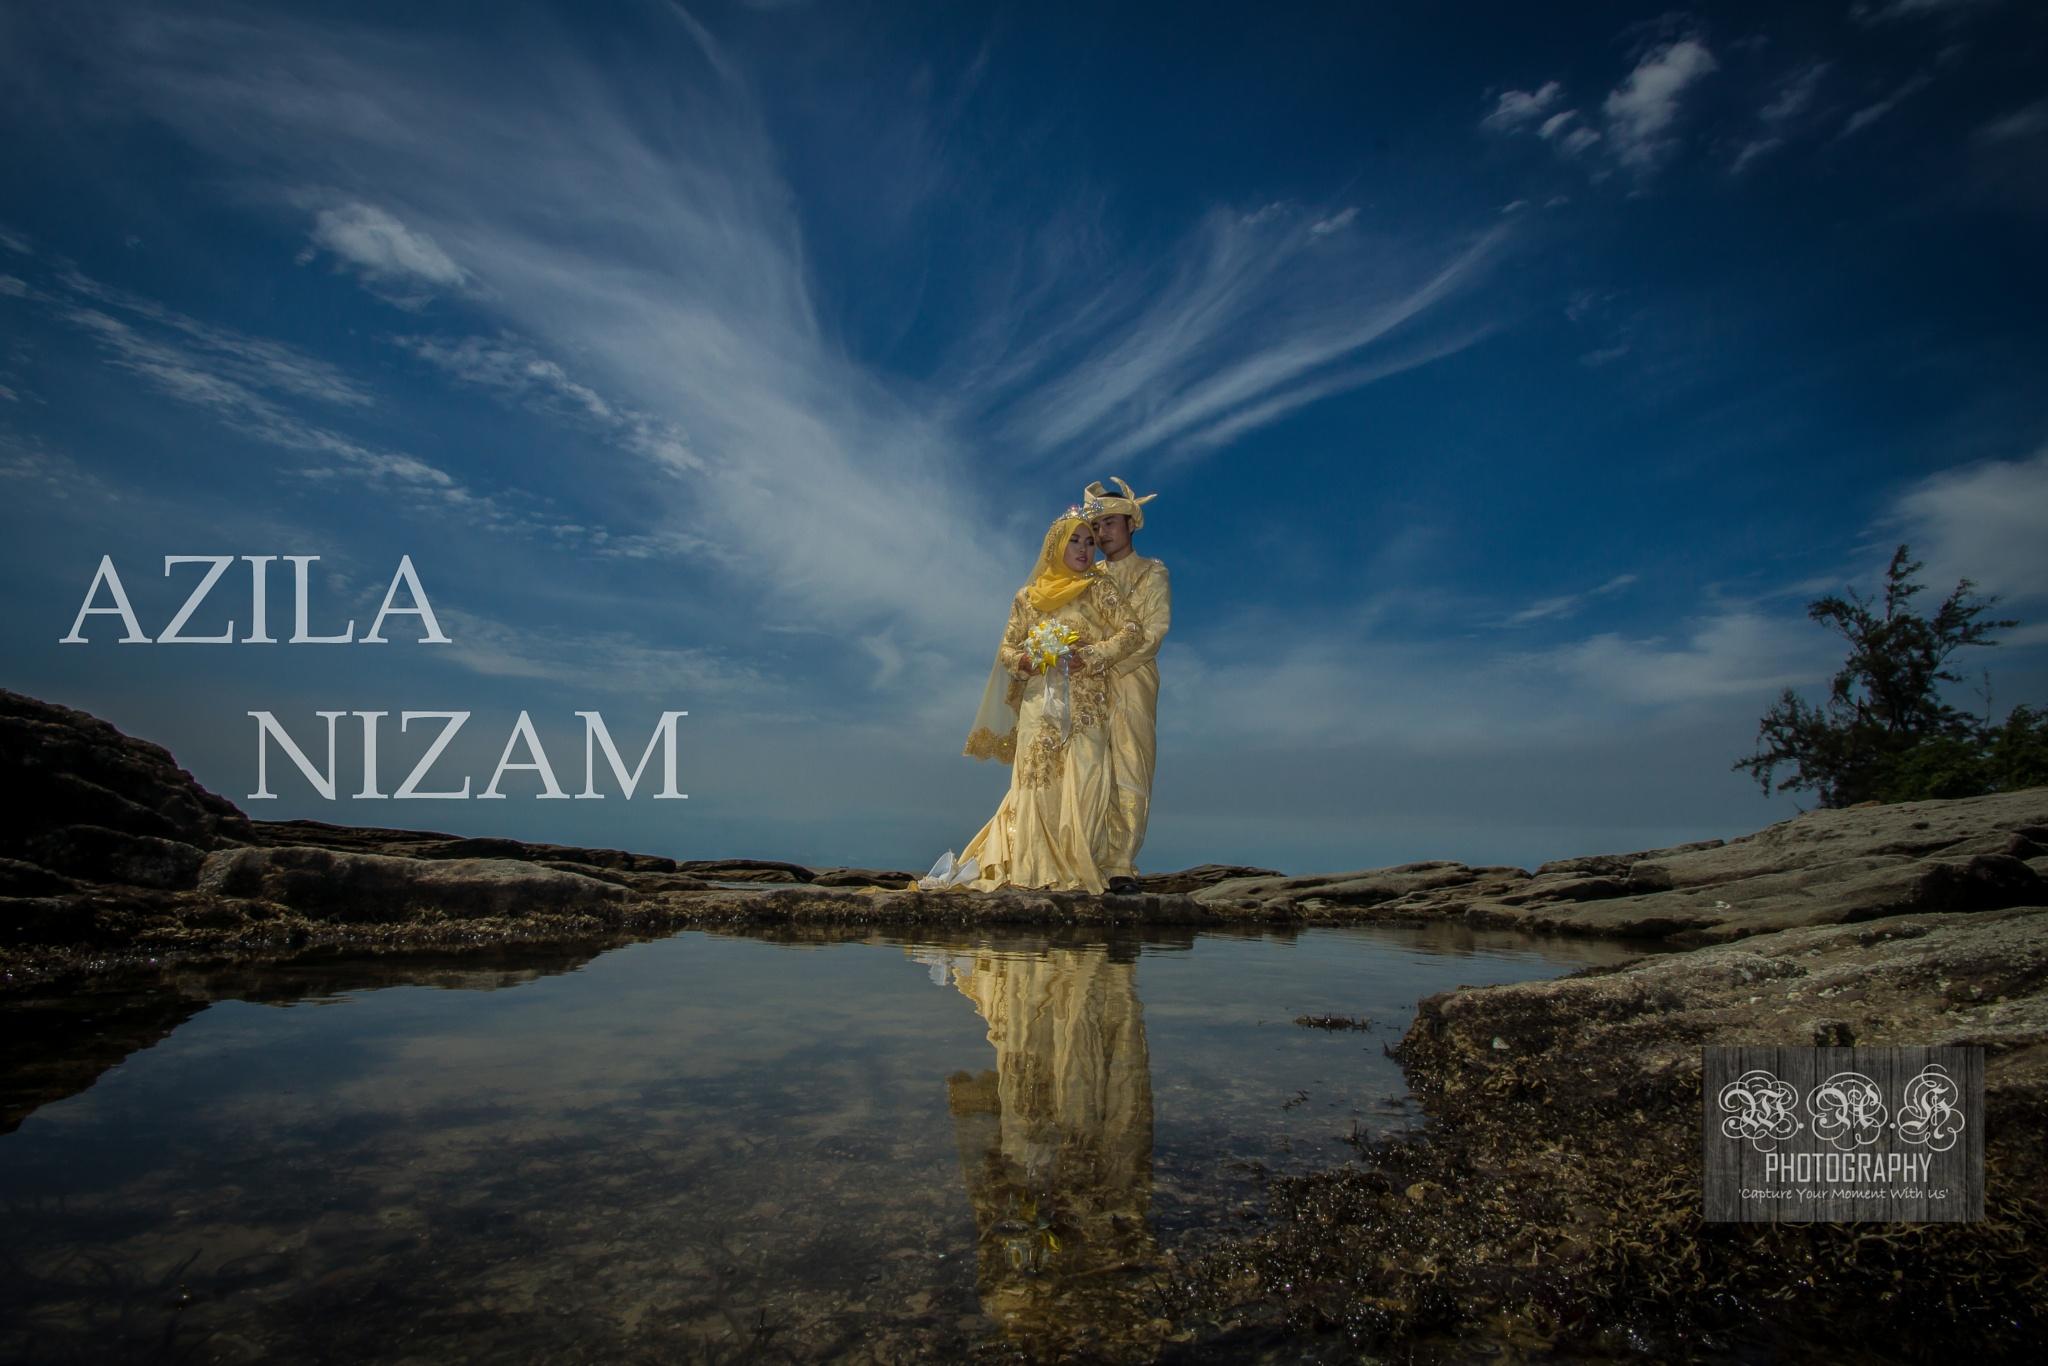 Azila & Nizam by Aaones'anth Damian